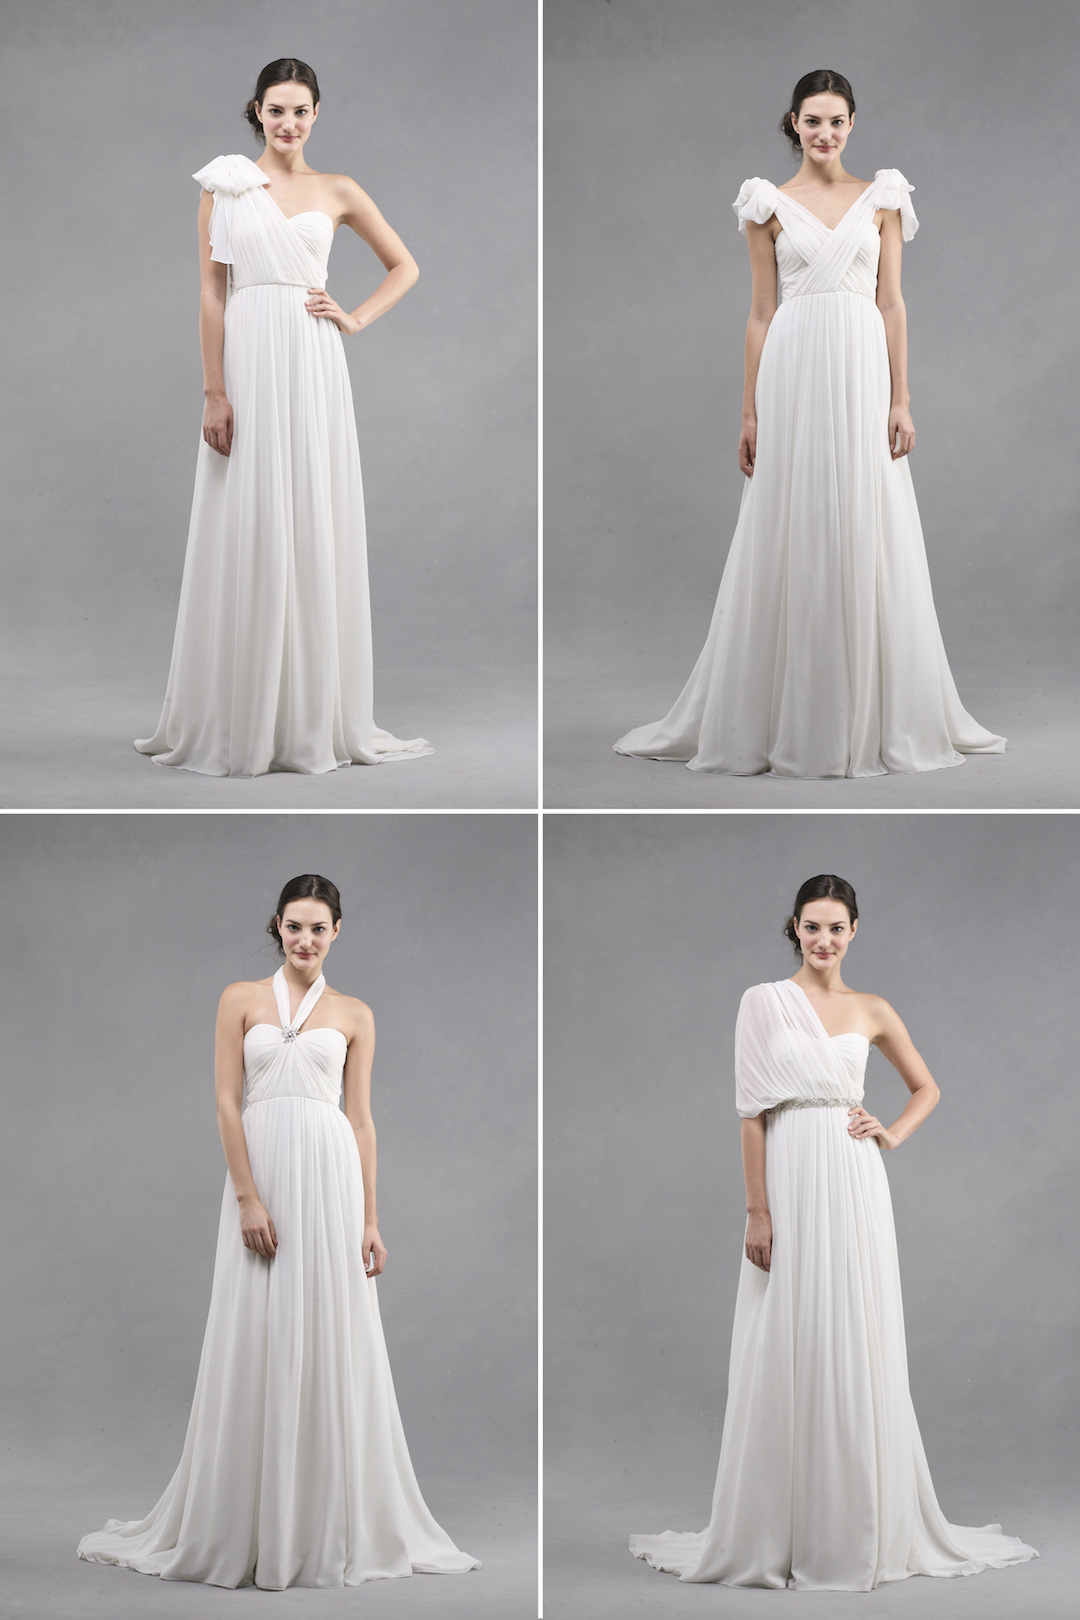 Convertible wedding dresses by jenny yoo 2013 bridal for Jenny yoo wedding dresses